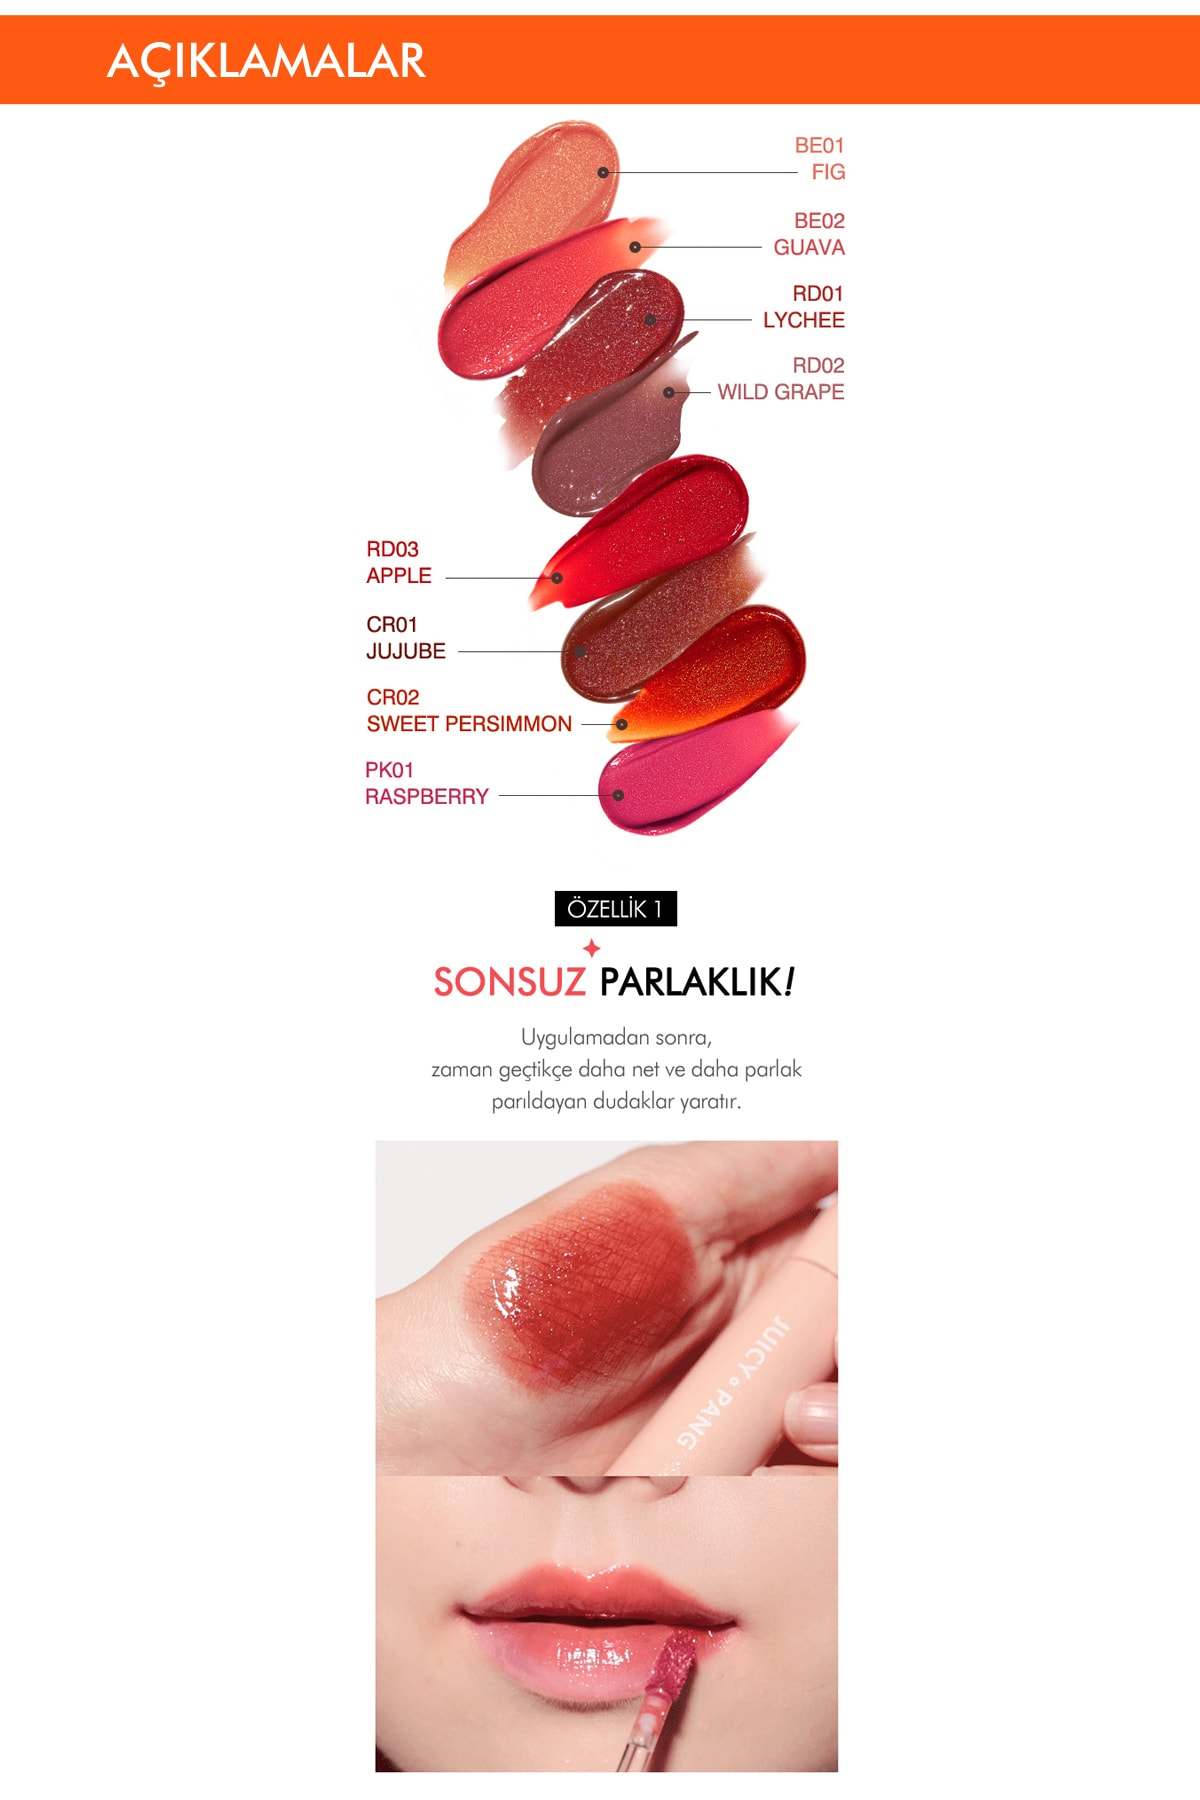 Missha Işıltı&Dolgunluk Veren Parlak Gloss Tint APIEU Juicy-Pang Sparkling Tint BE01 3